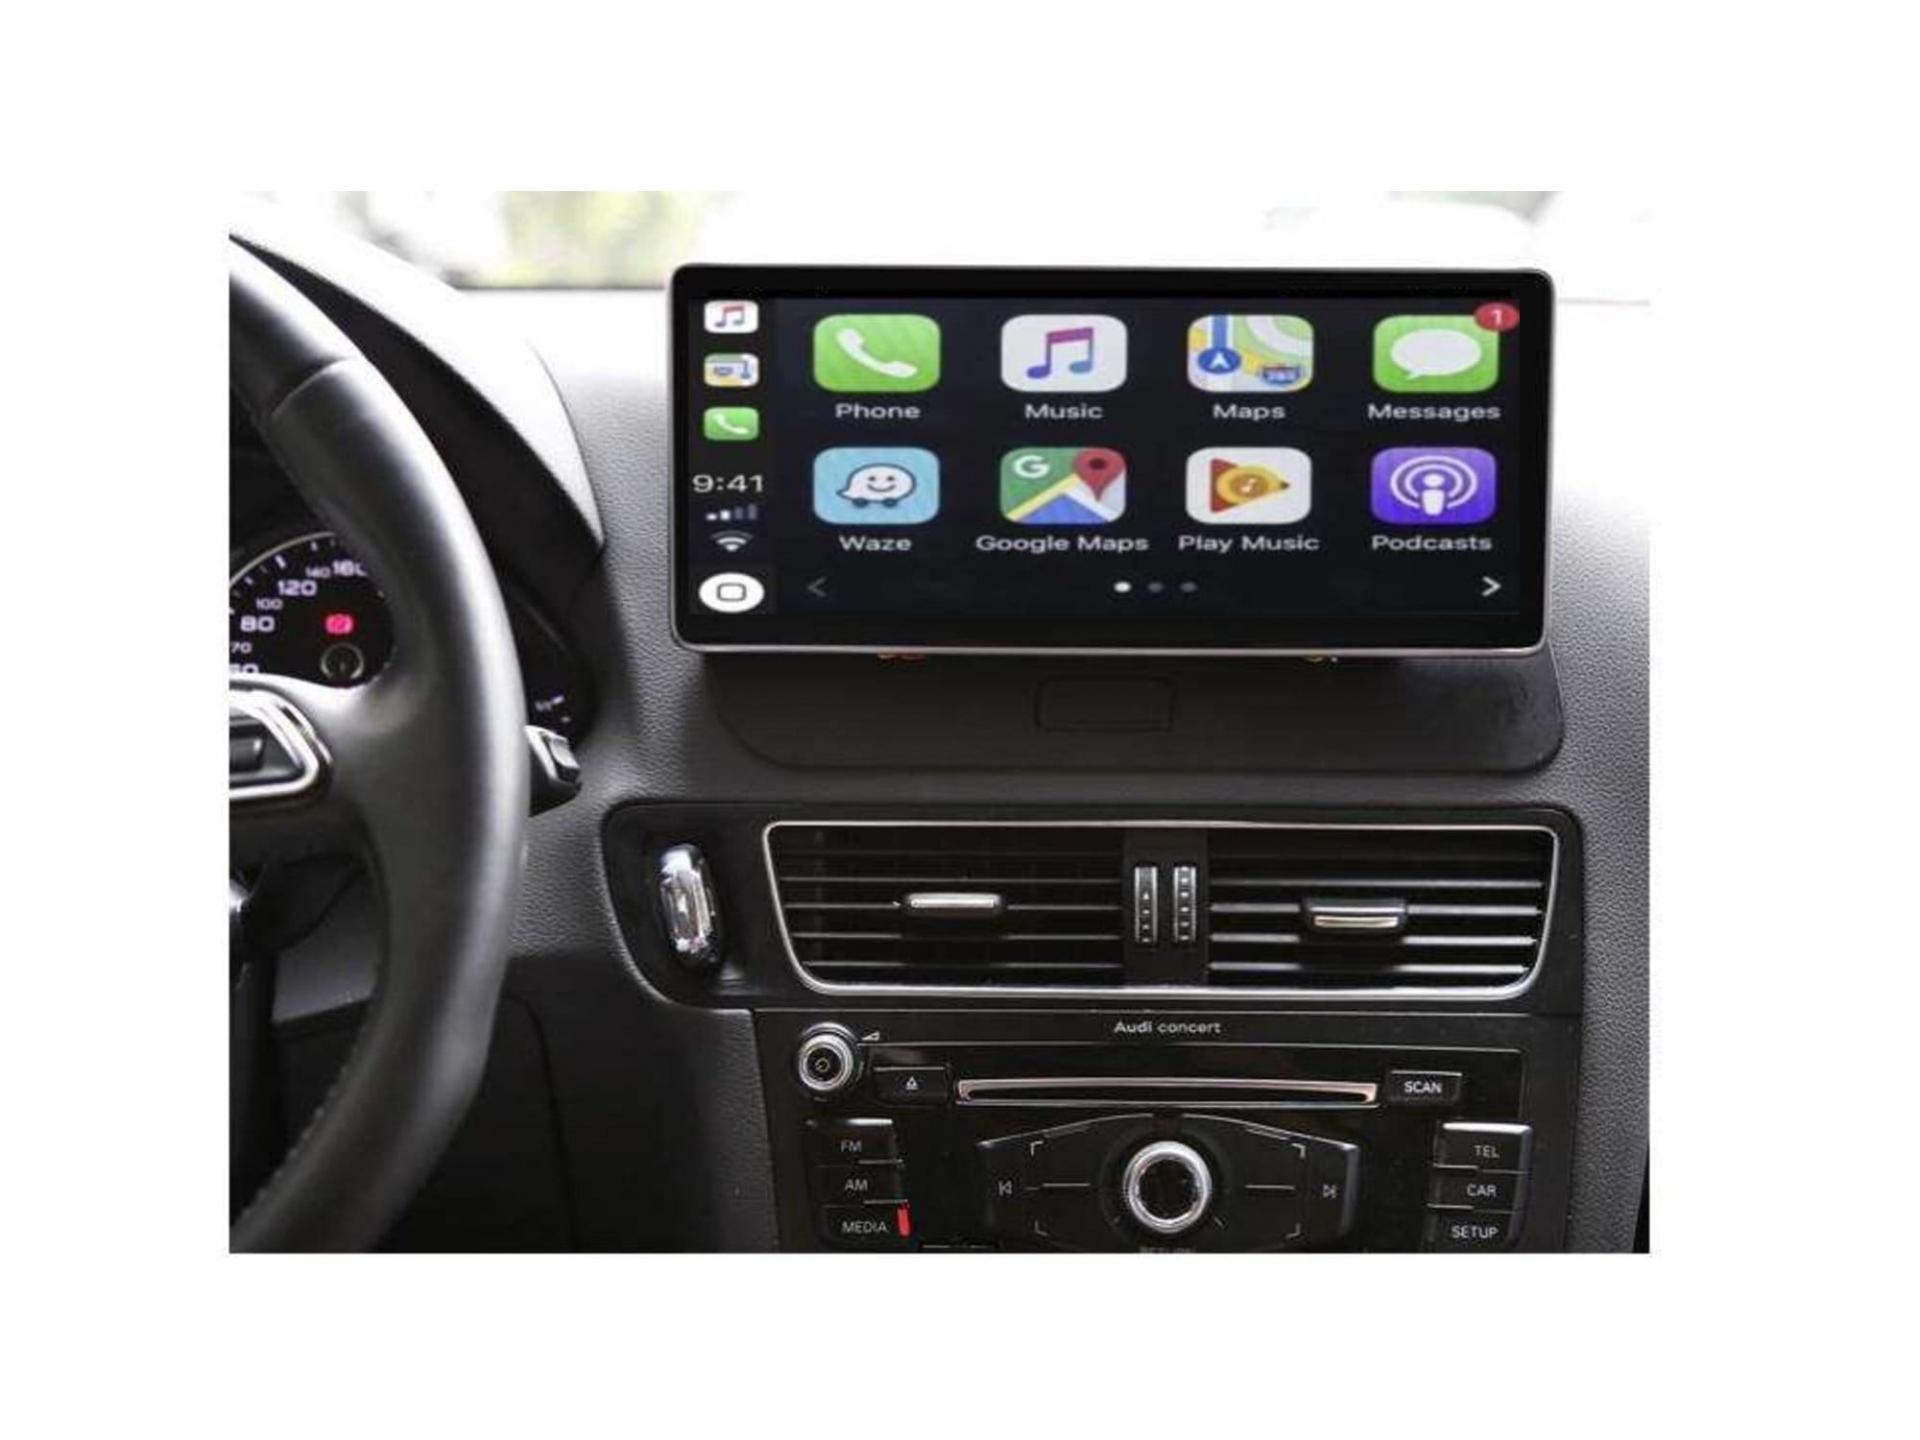 Audi a4 a5 a6 q7 q5 q3 autoradio gps carplay android auto gps bluetooth 18